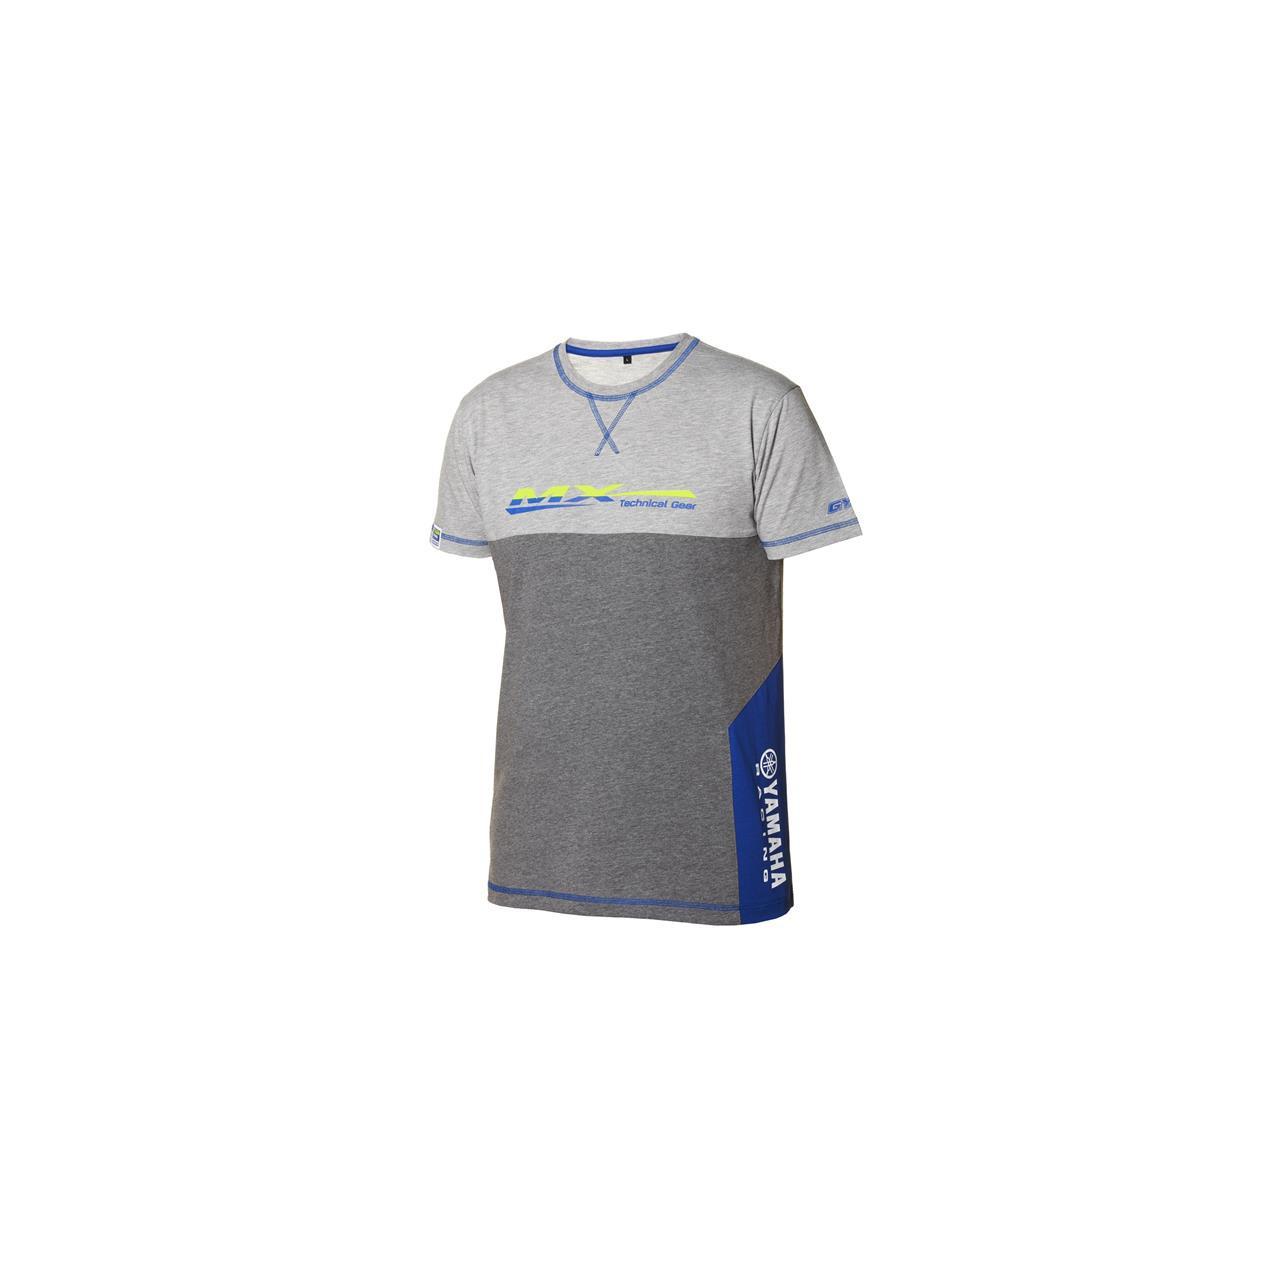 YAMAHA T-shirt adulte MX Ipswich 2017